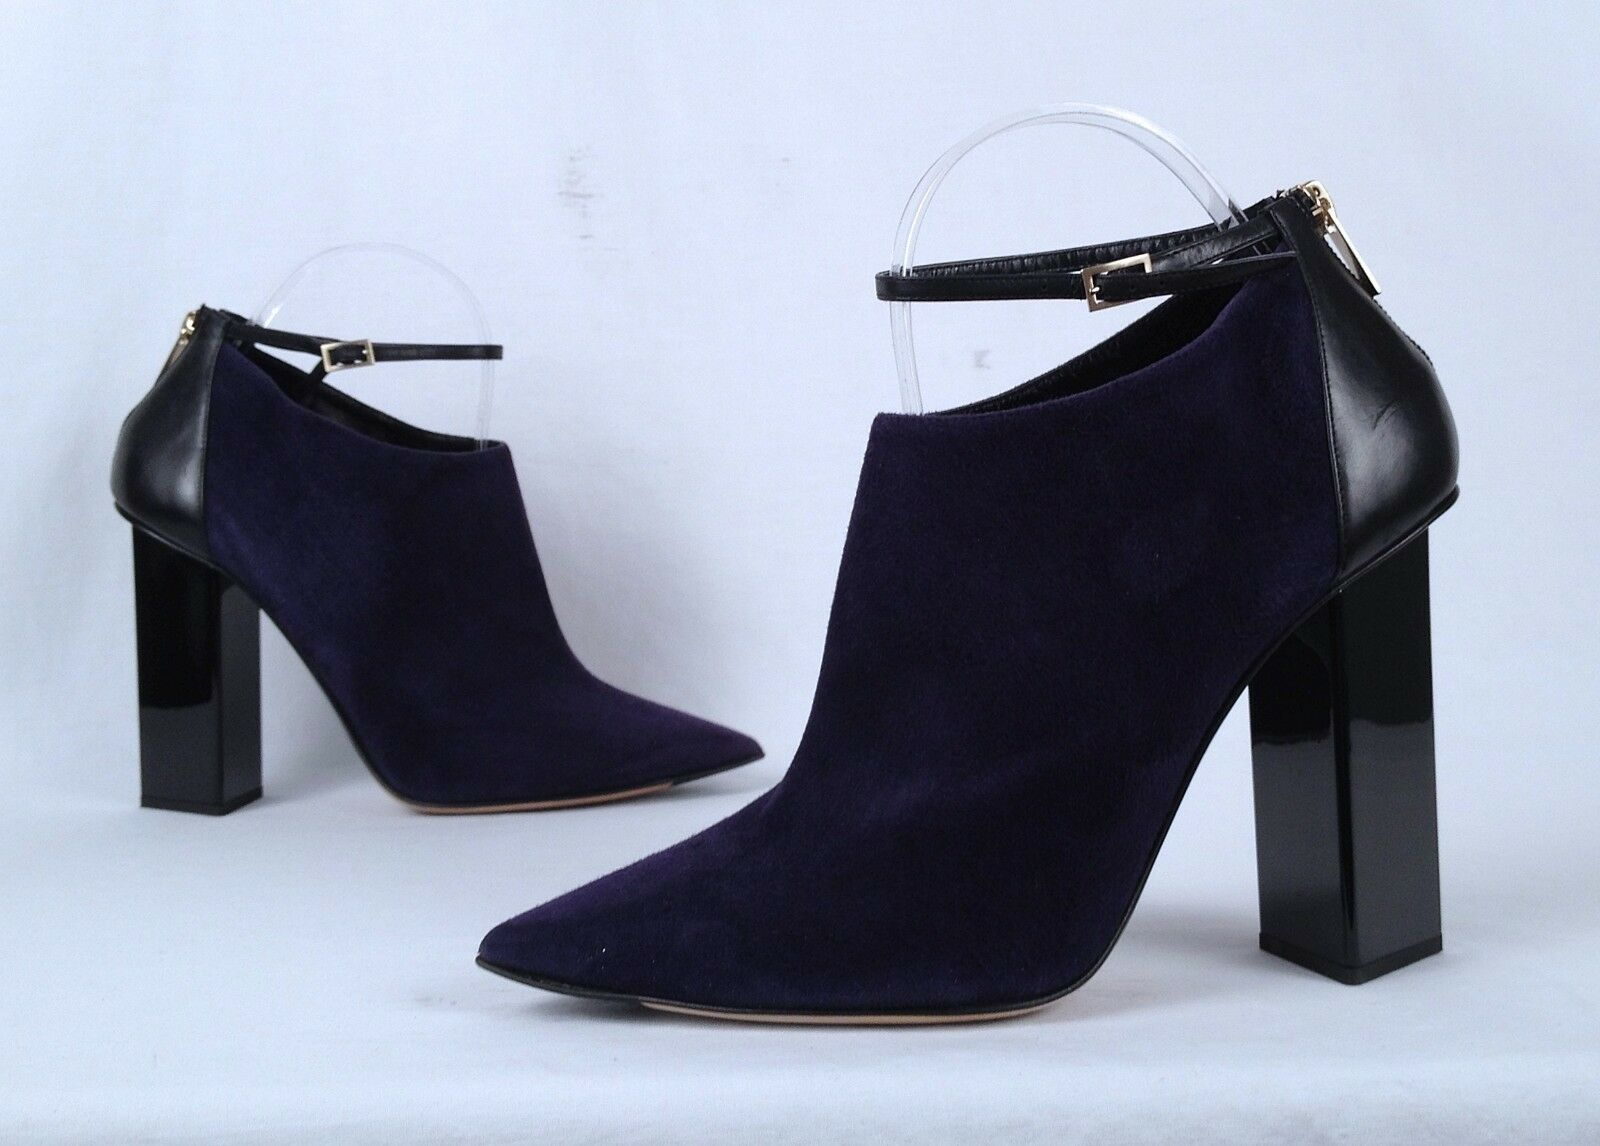 Jimmy Choo Ankle Strap Stiefelie- Stiefelie- Strap lila Suede -Größe 9.5 US  39.5 EU  998 (P19) 471359